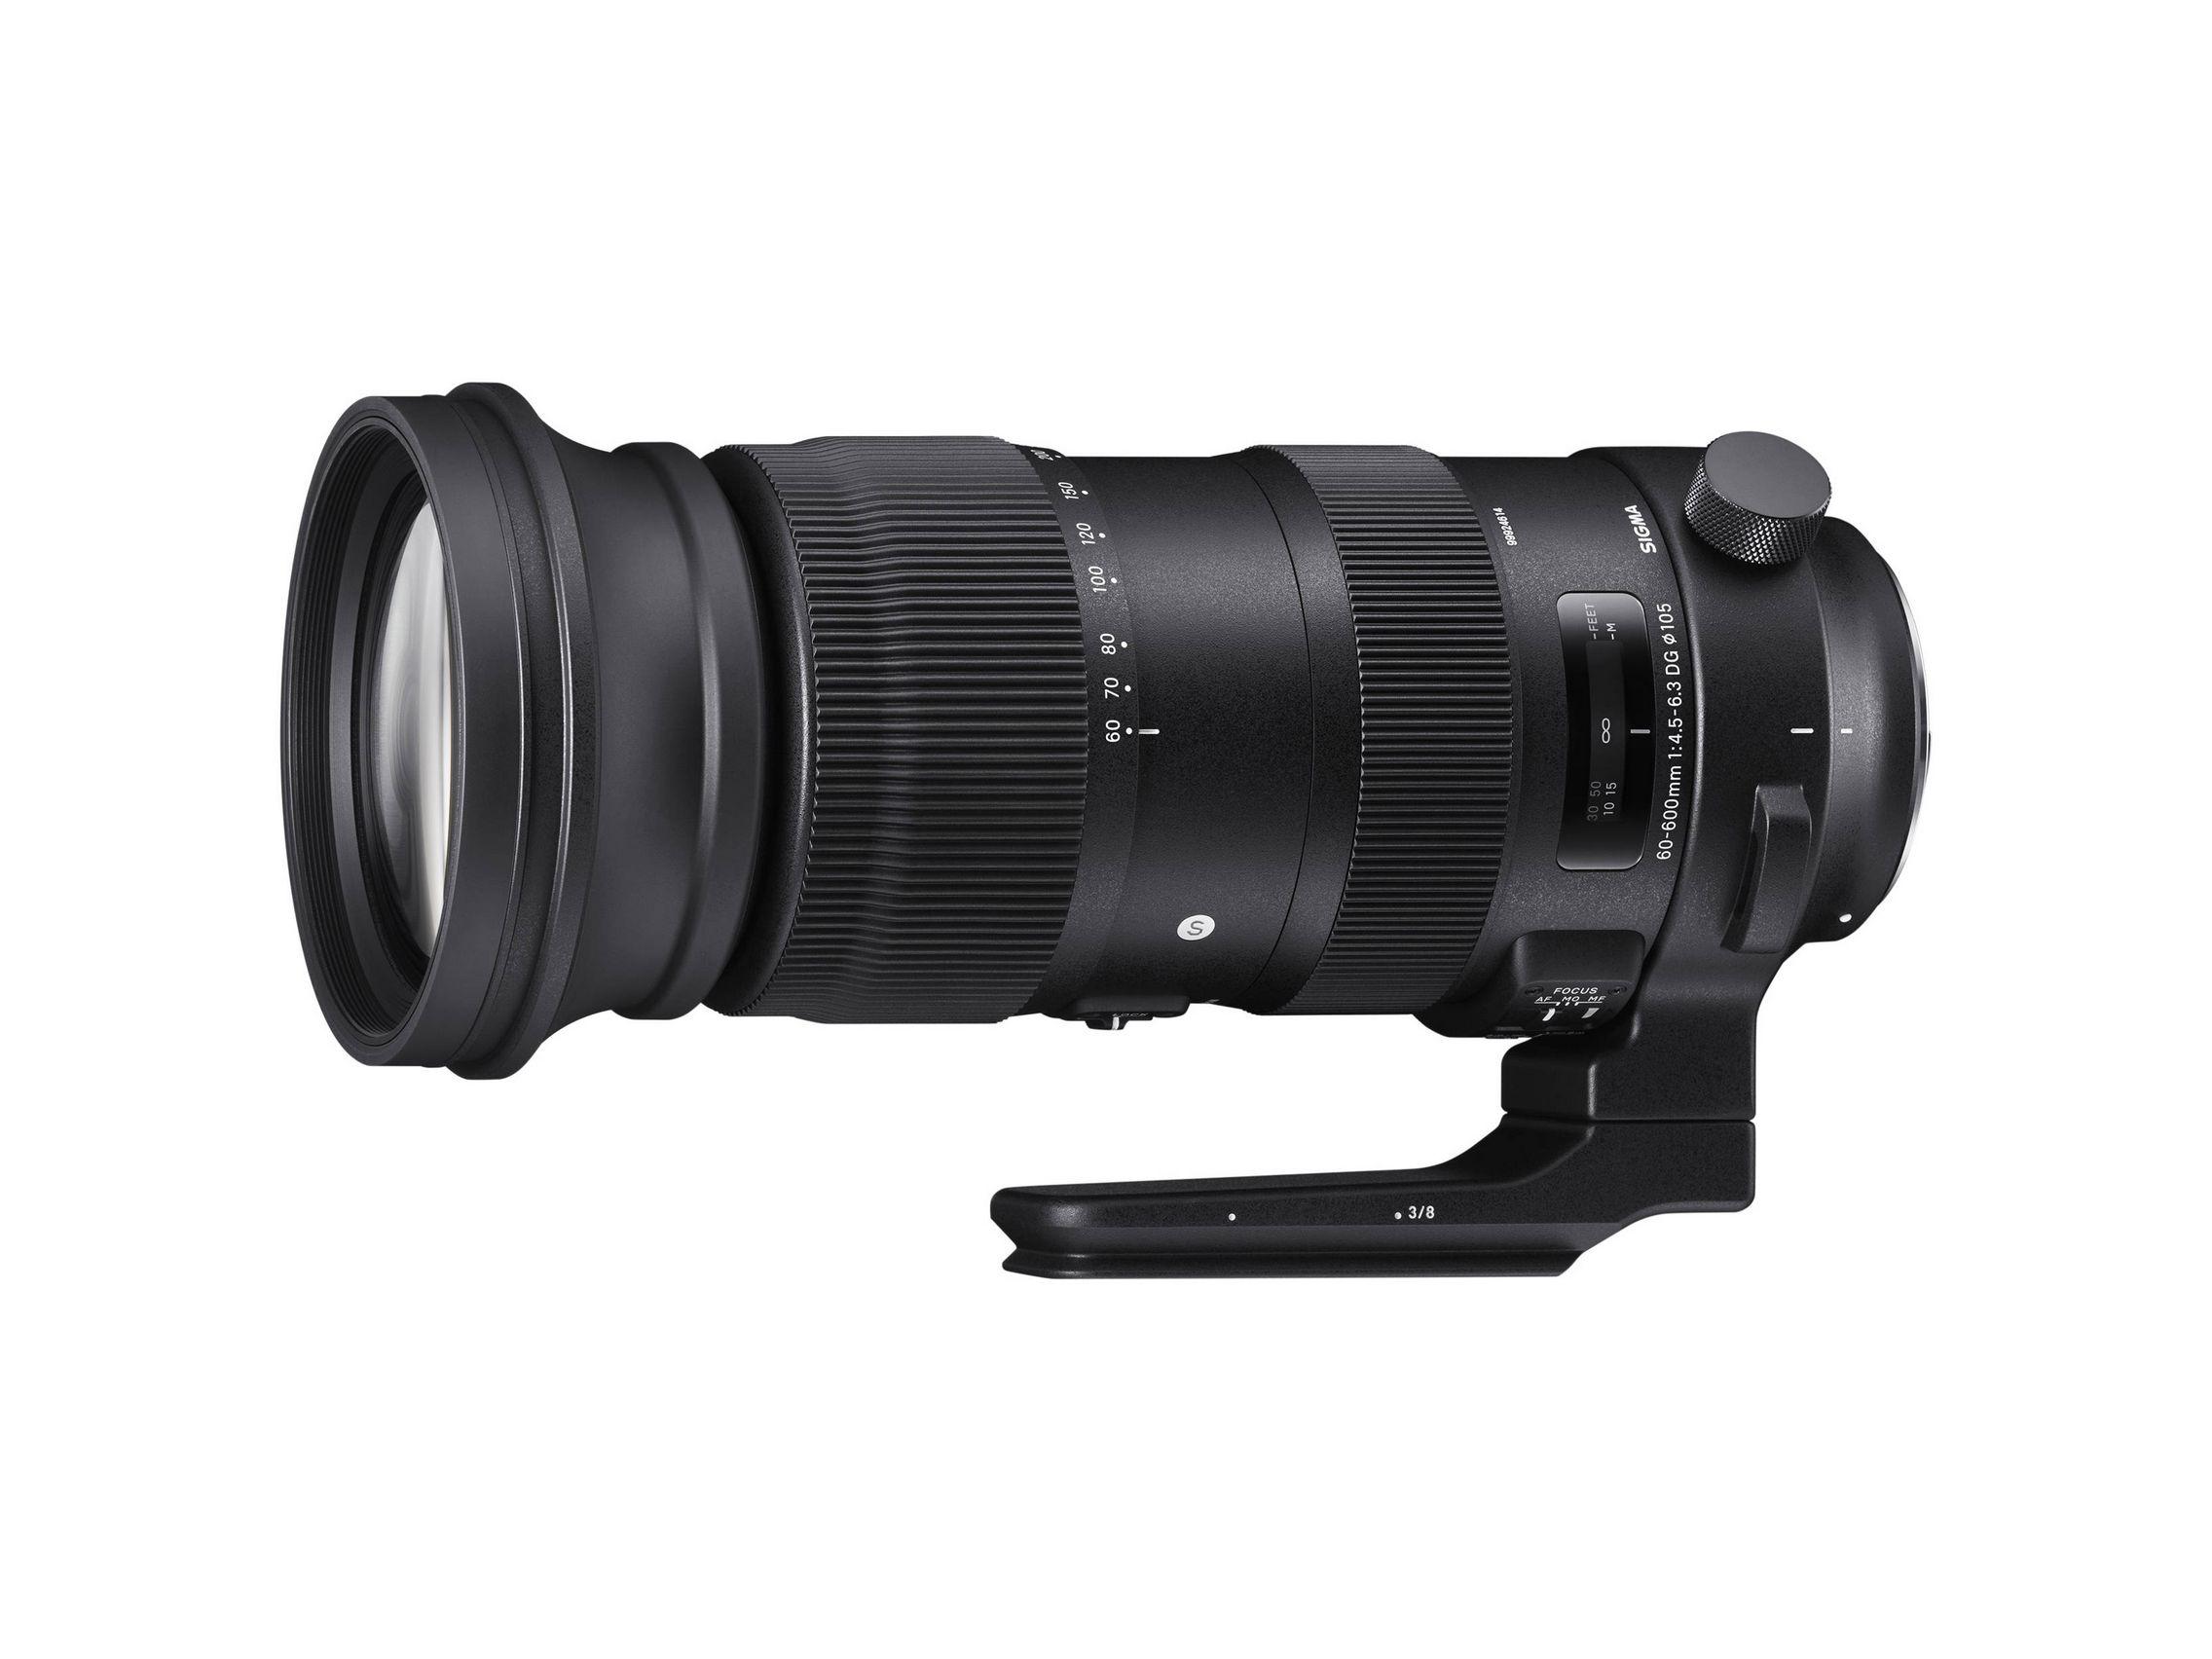 Sigma 60-600mm 1:4.5-6.3 DG S (Sport, OS)